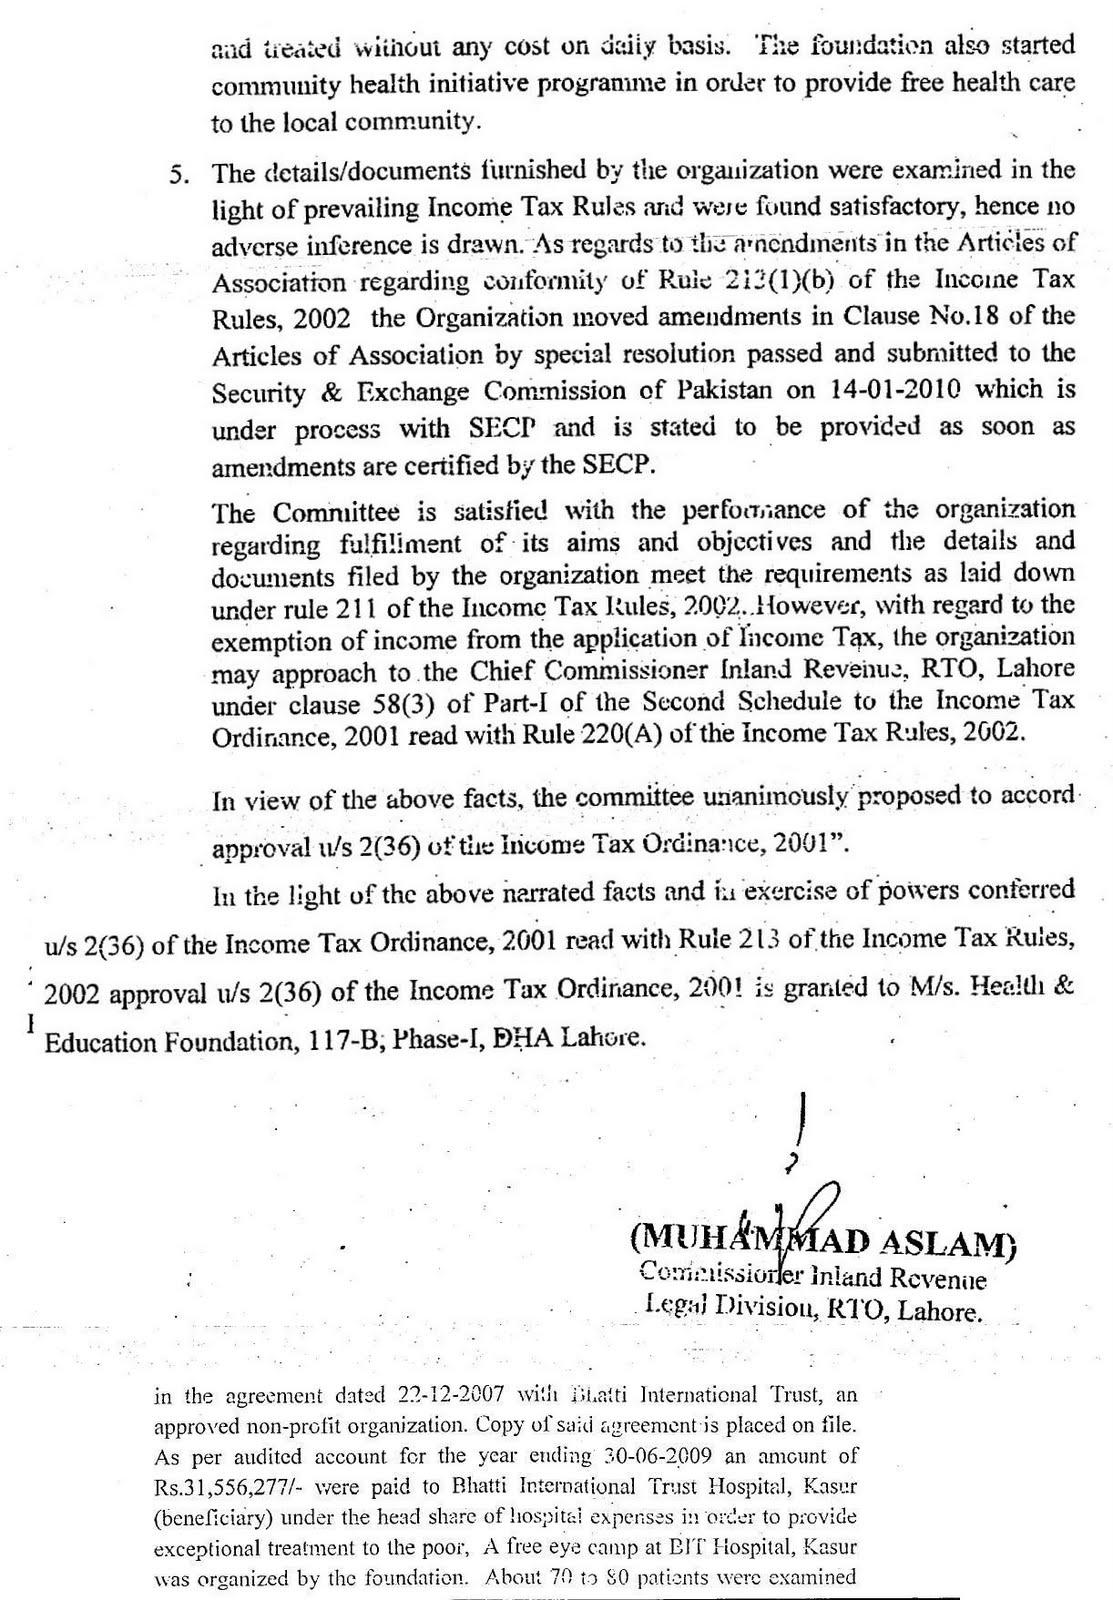 Health education foundation pakistan tax exemption certificate tax exemption certificate fbr govt of pakistan xflitez Images